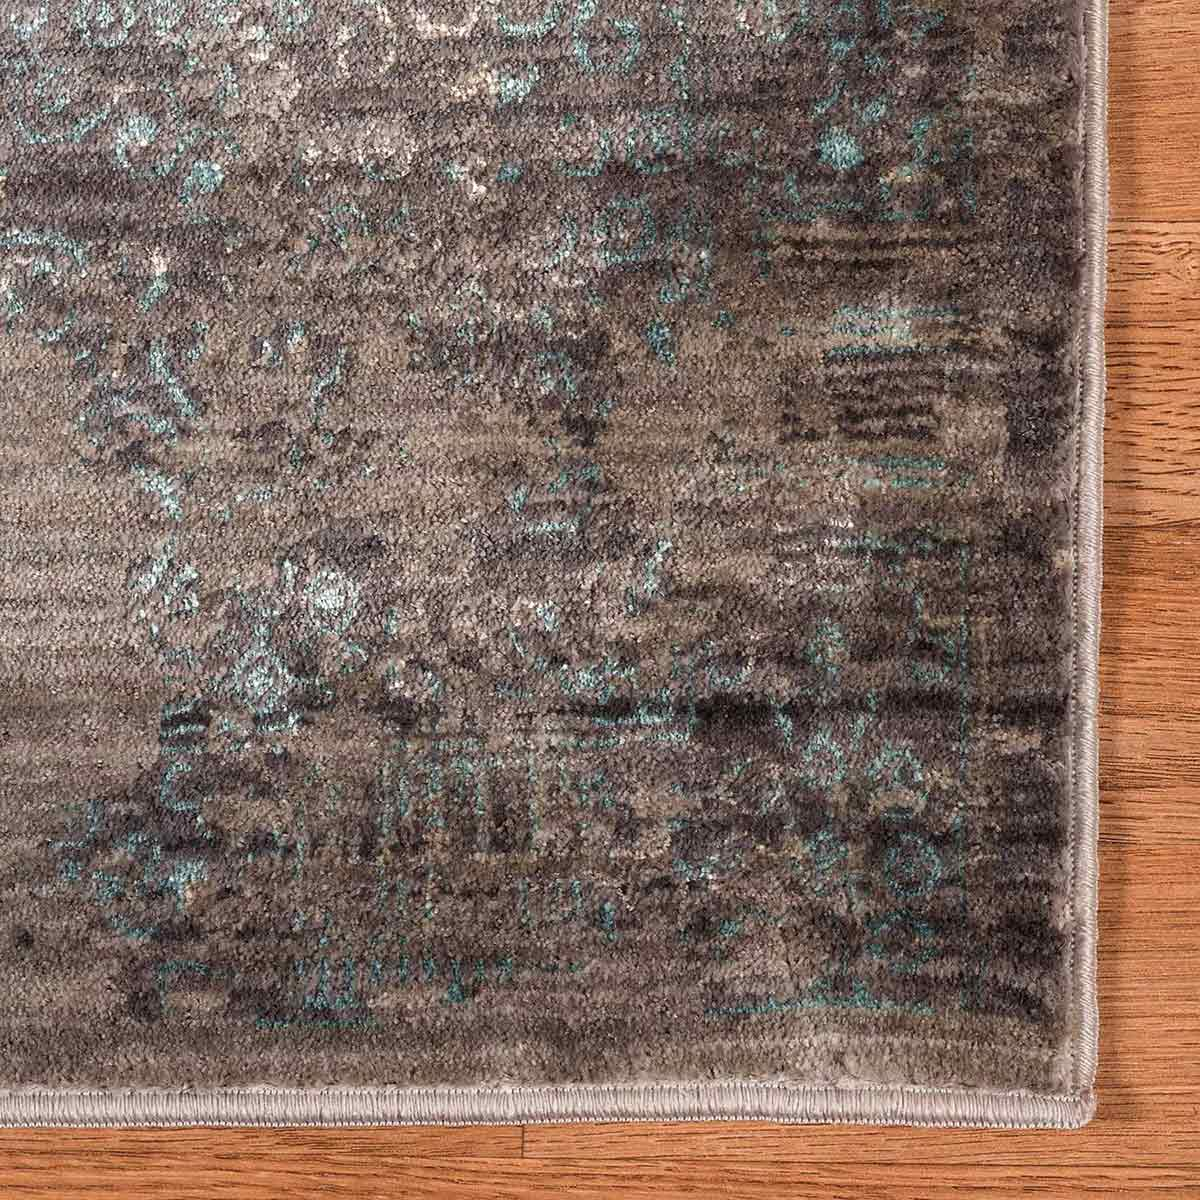 Uttermost Calandria 9 X 13 Rug - Gray